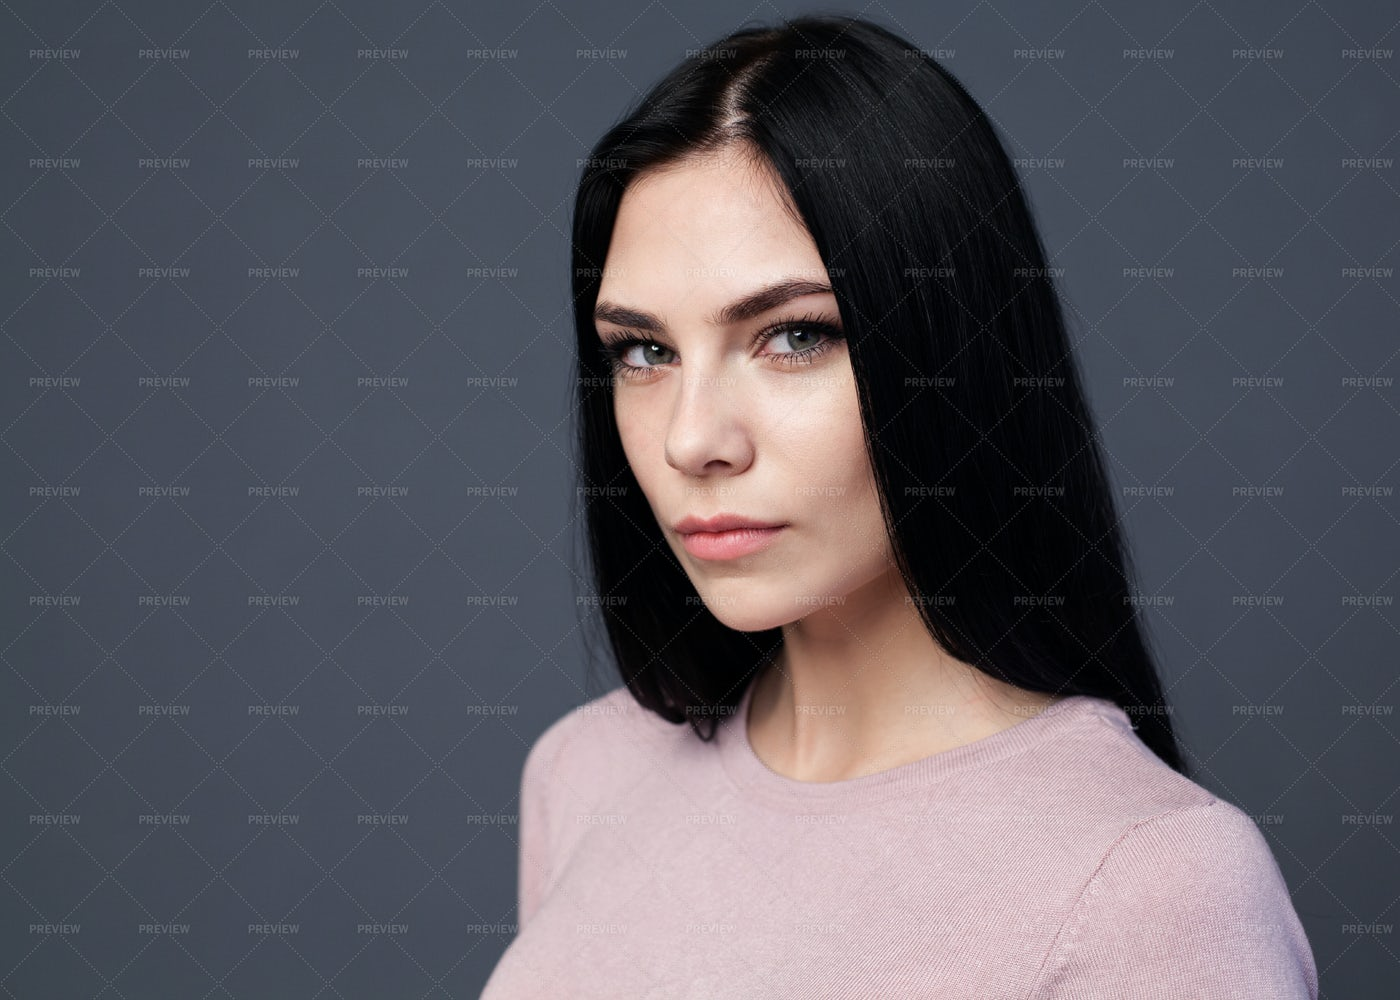 Woman With Long Black Hair: Stock Photos